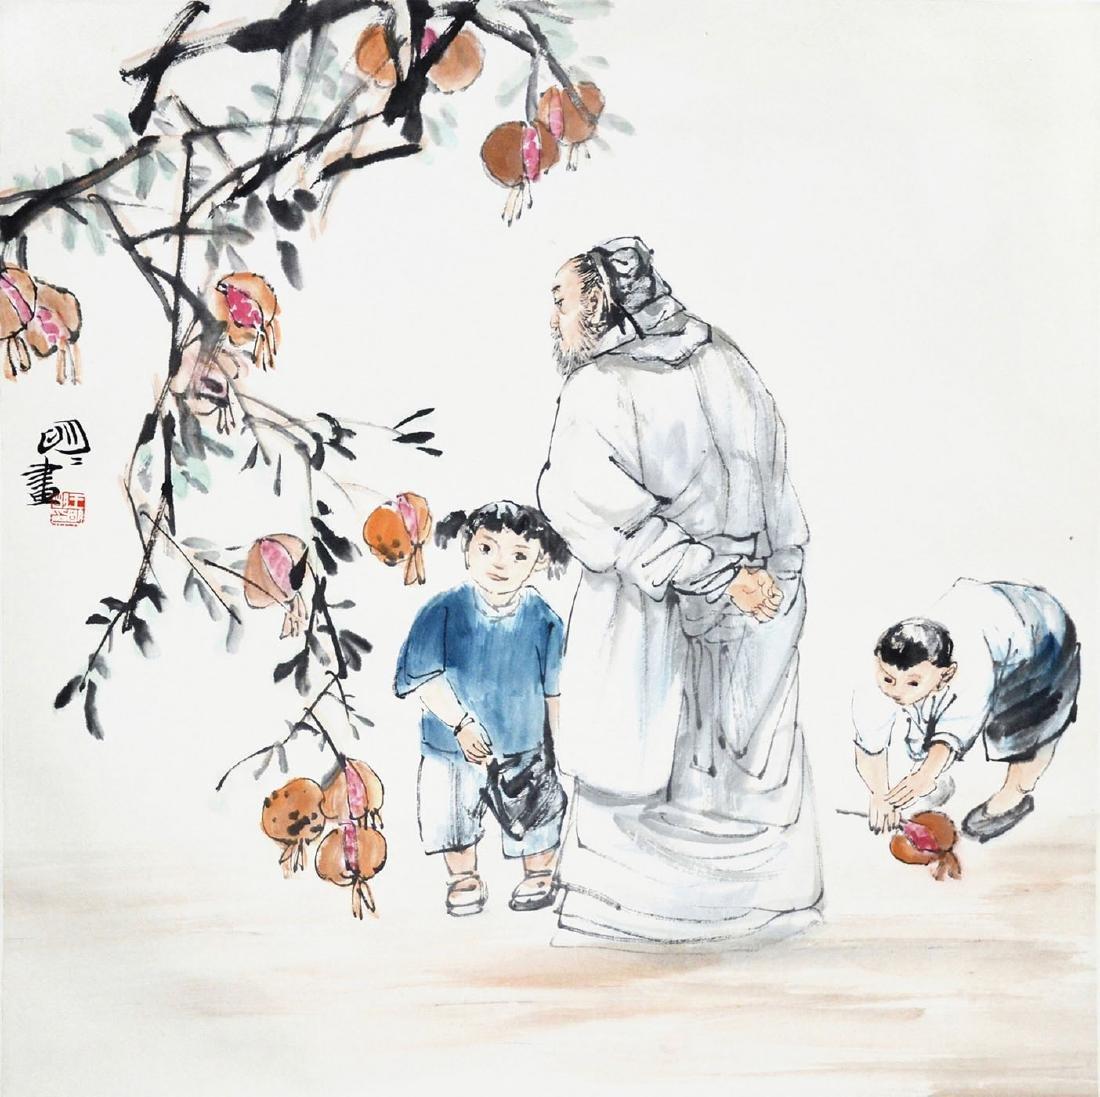 Wang Mingming Under the Pomegranate Tree